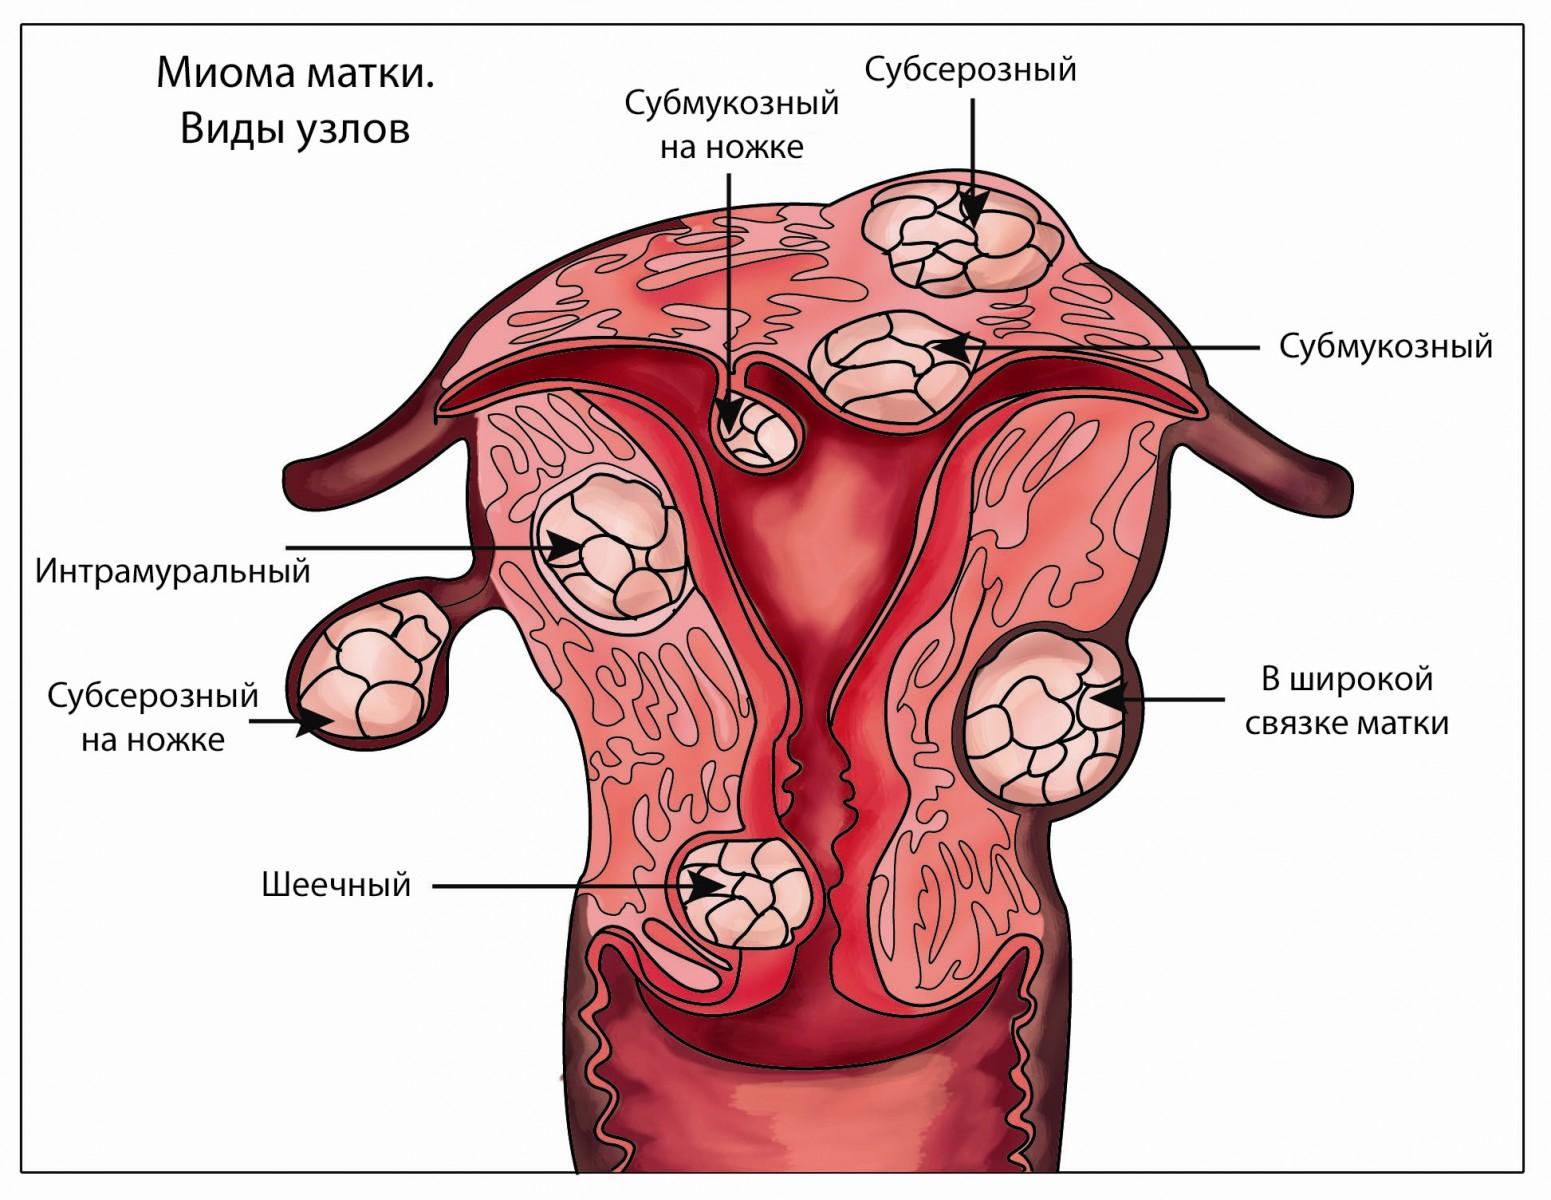 Реферат опухоли матки 3 фотография